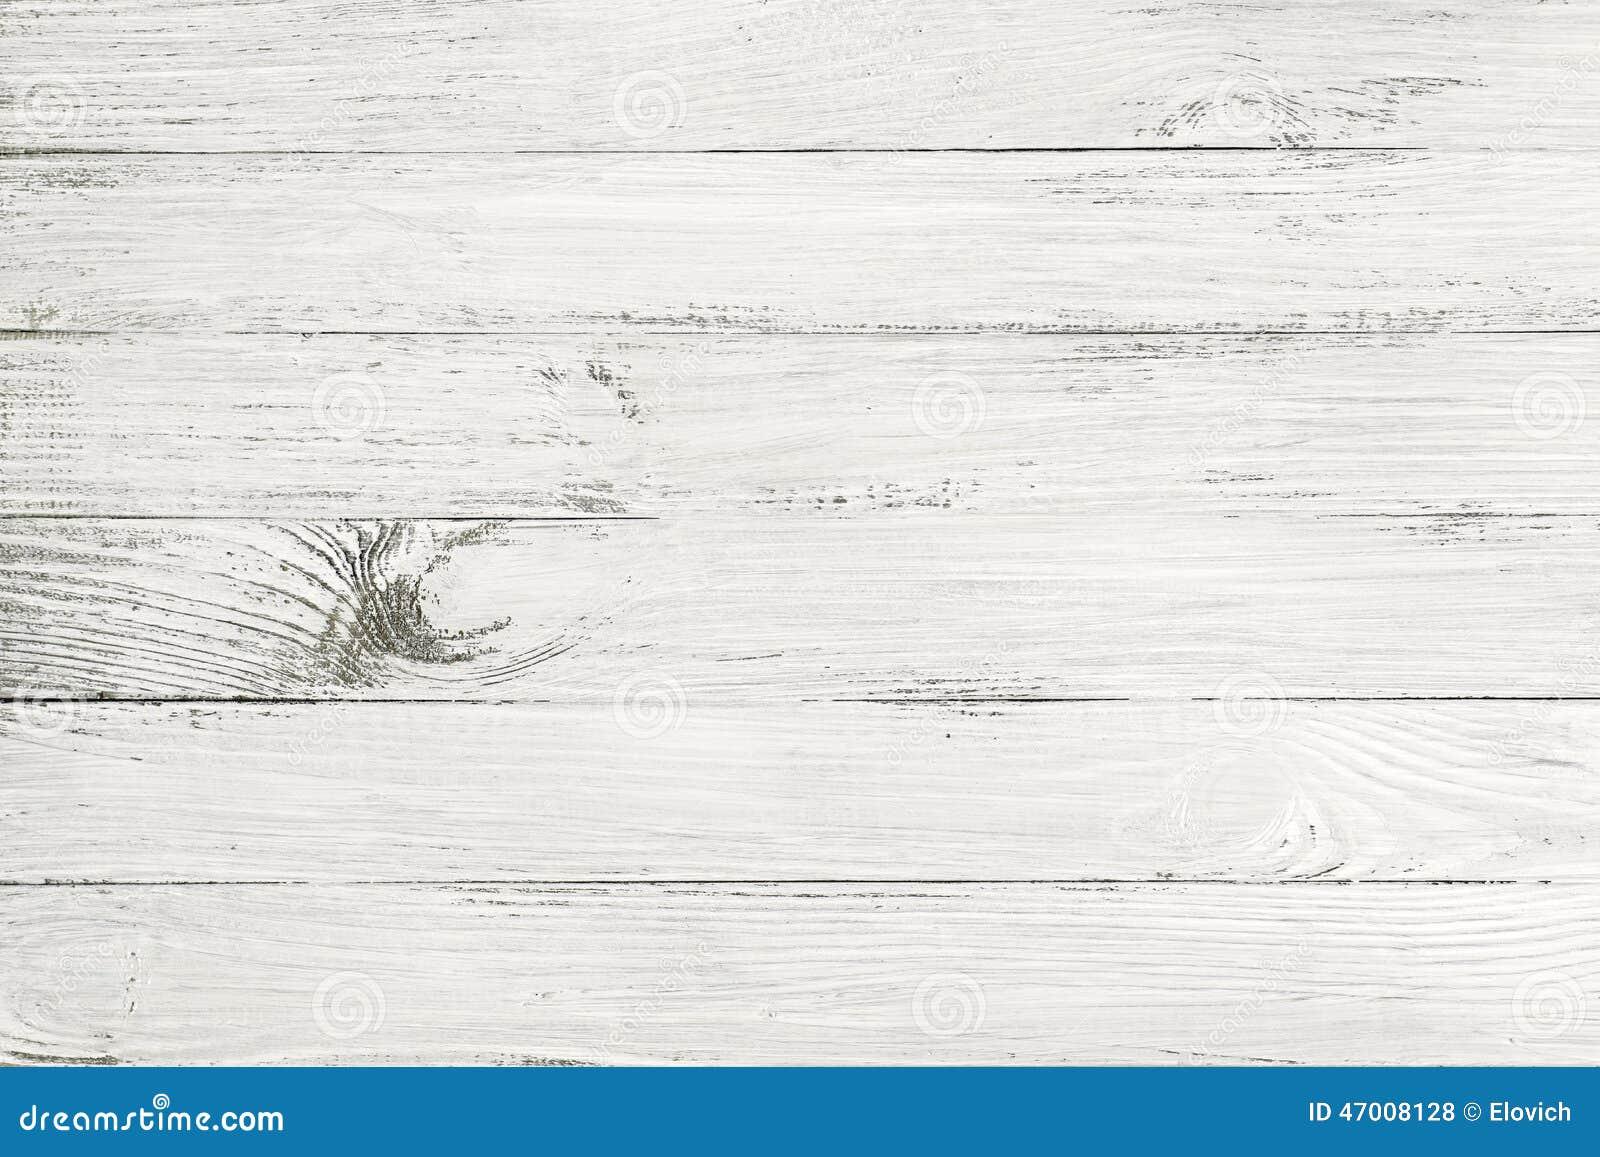 Vintage White Wooden Texture Stock Photo - Image: 47008128